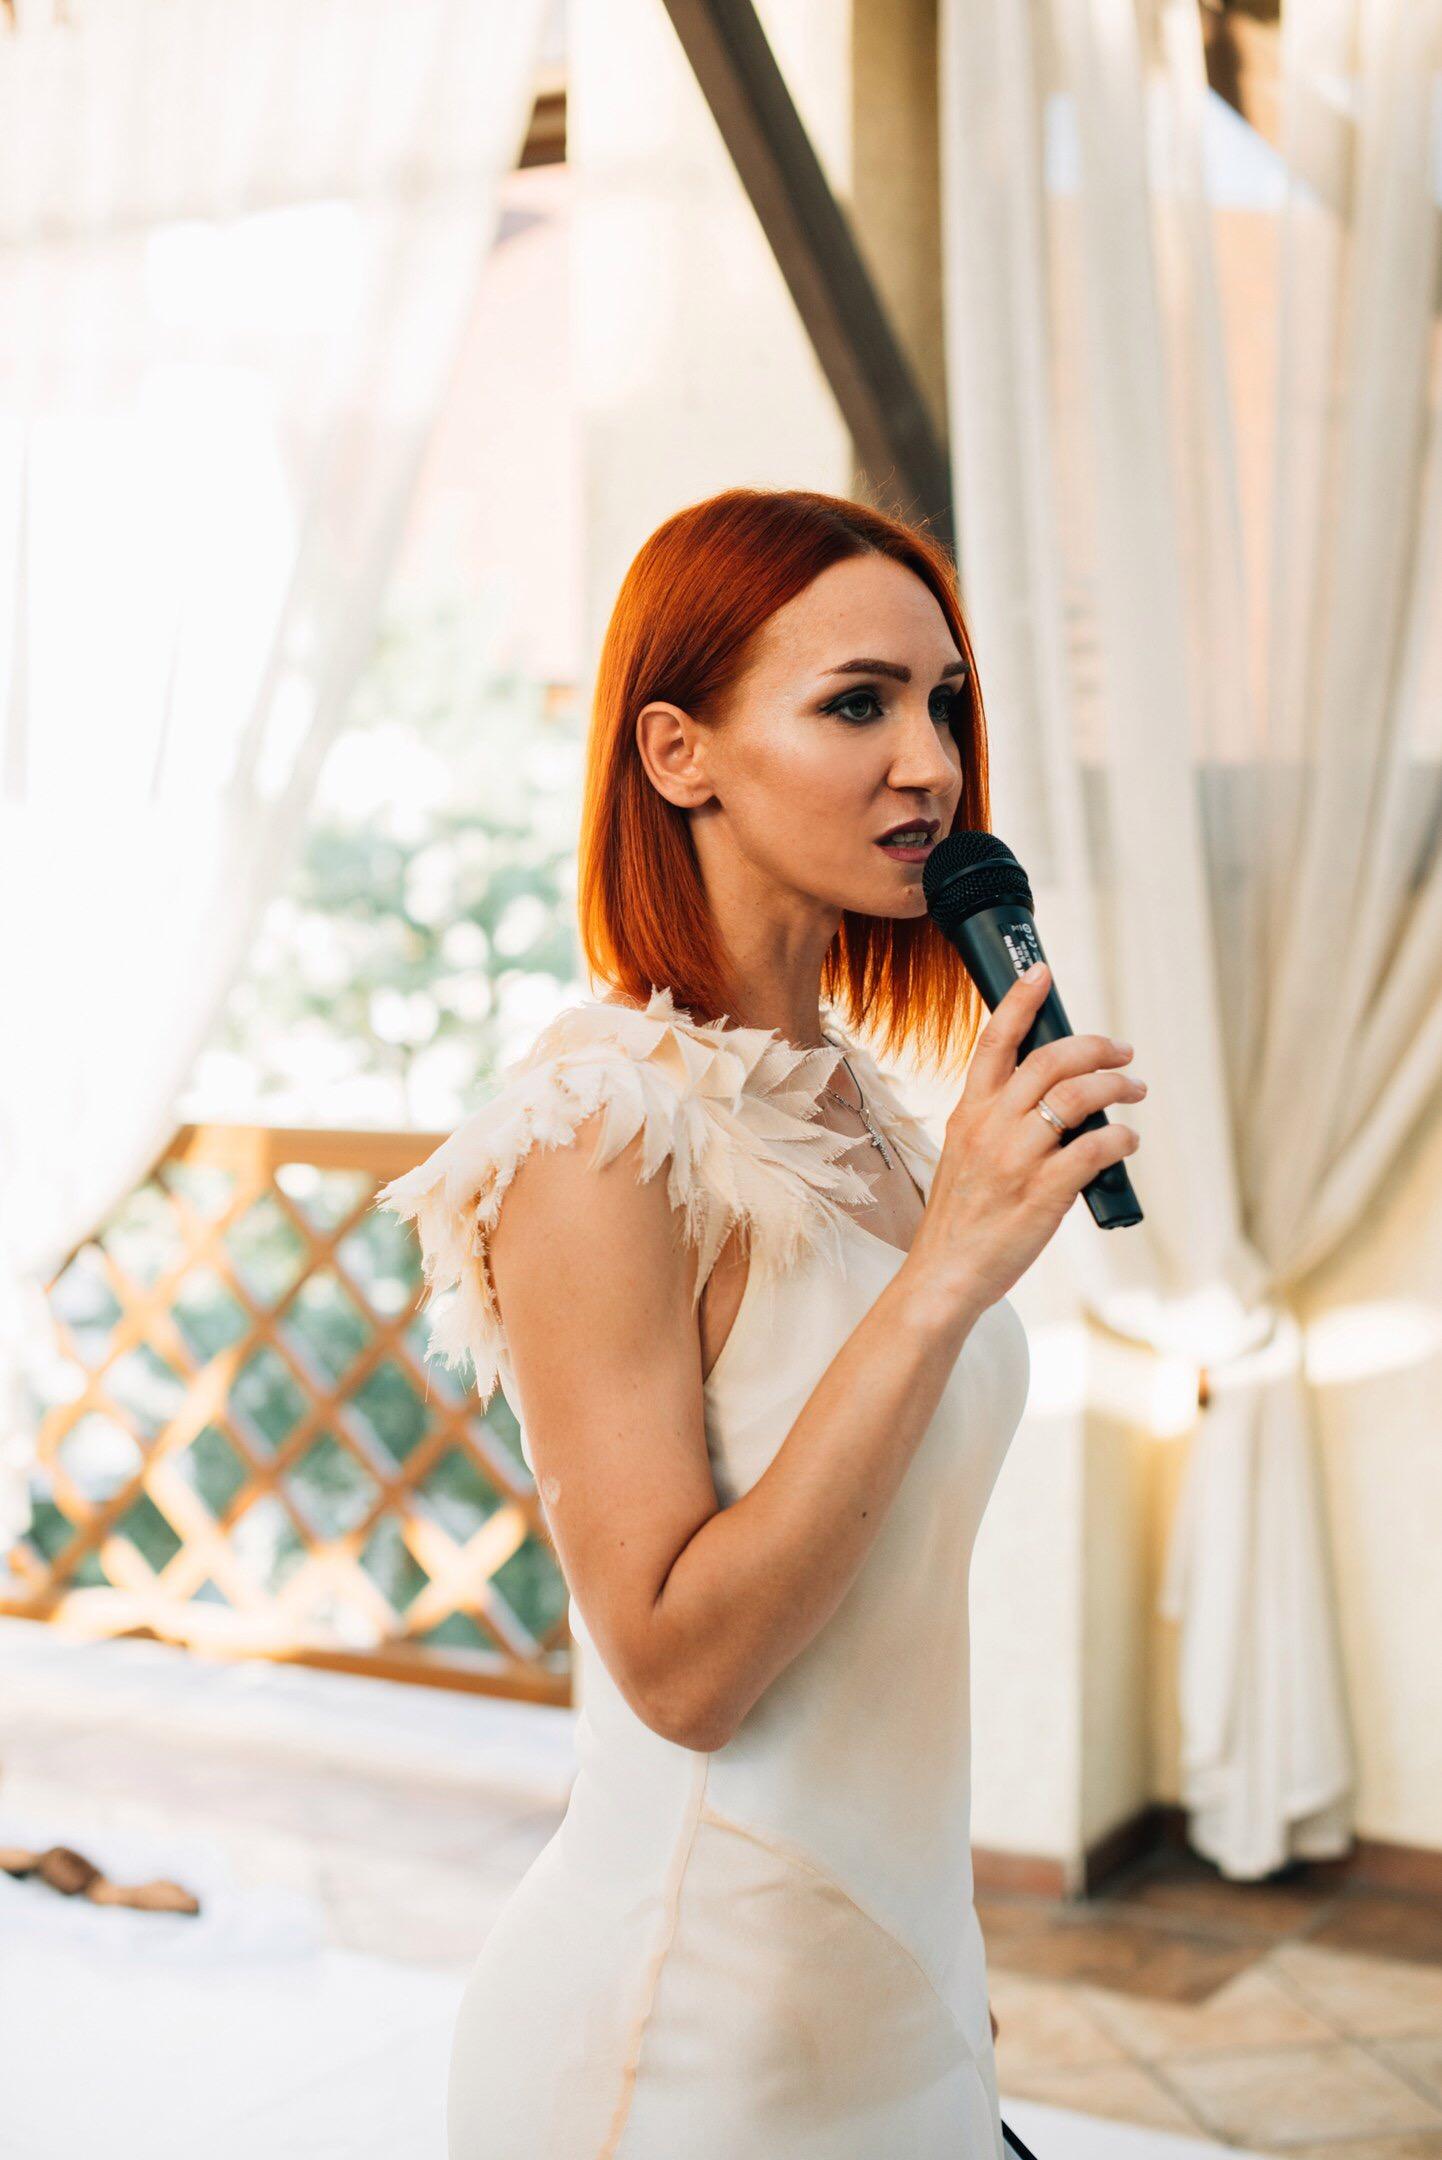 Татьяна Ткачева в Ростове-на-Дону